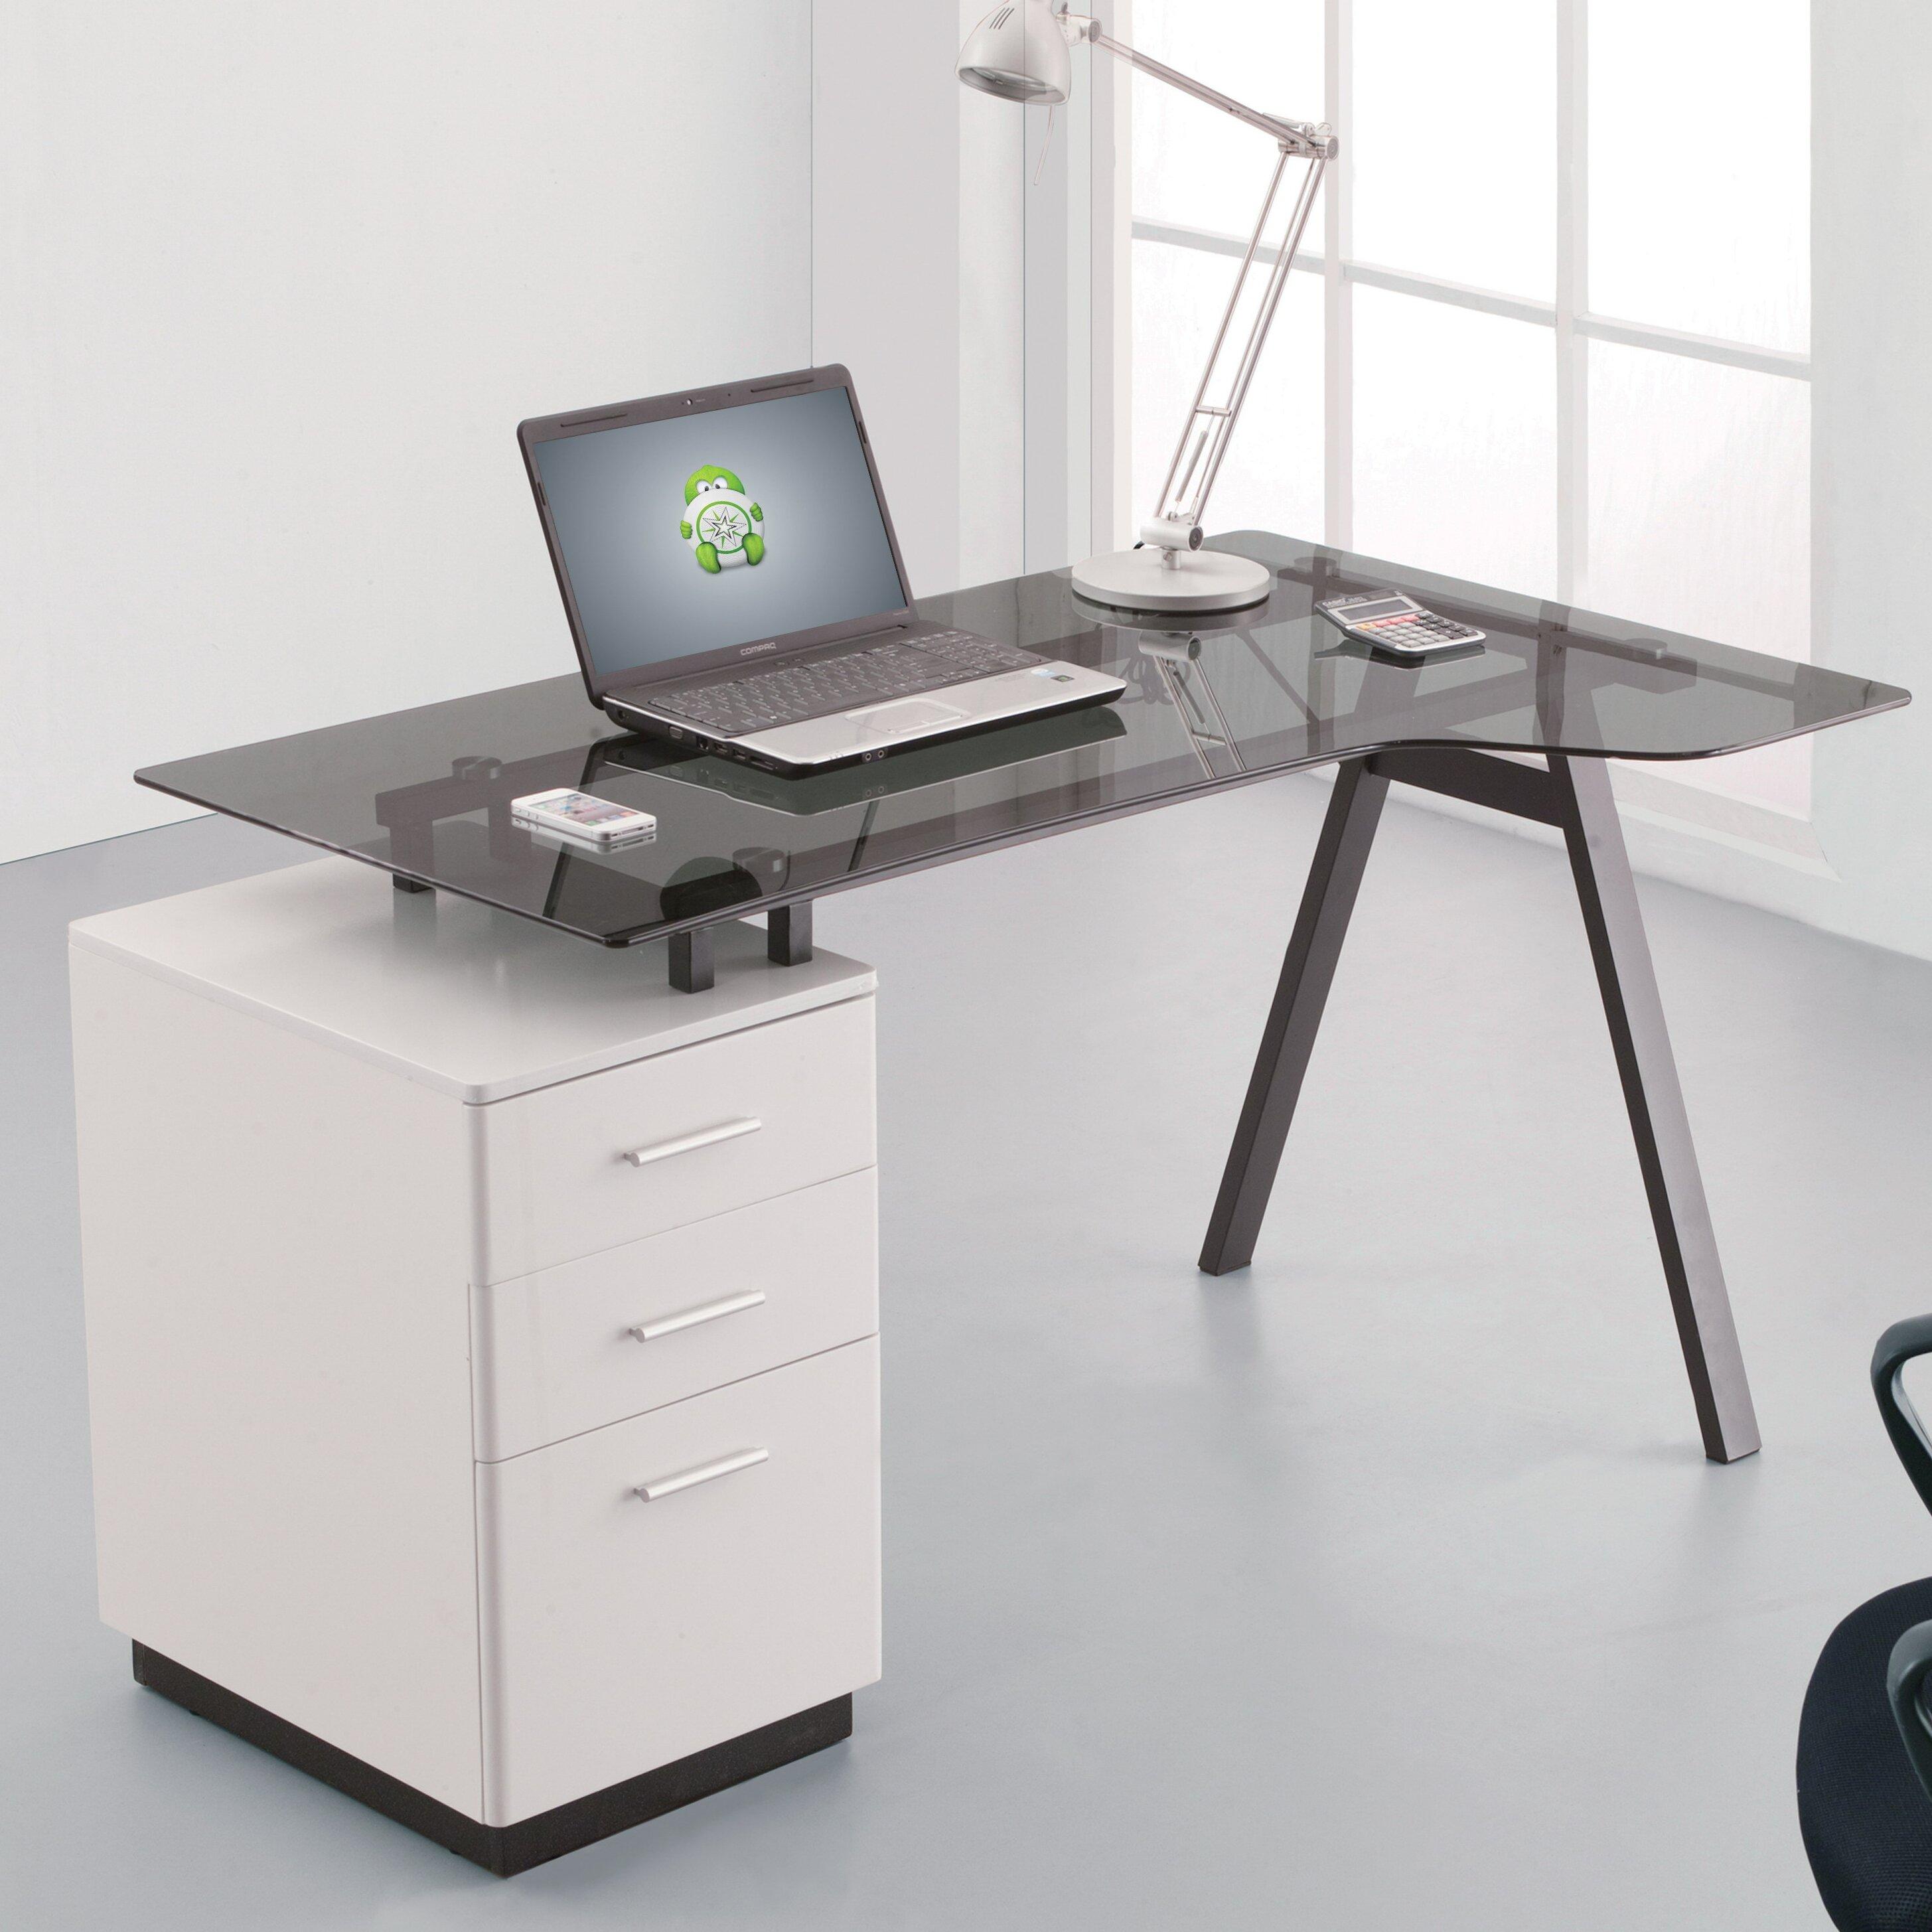 Home etc design first computer desk reviews wayfair uk for Furniture etc reviews